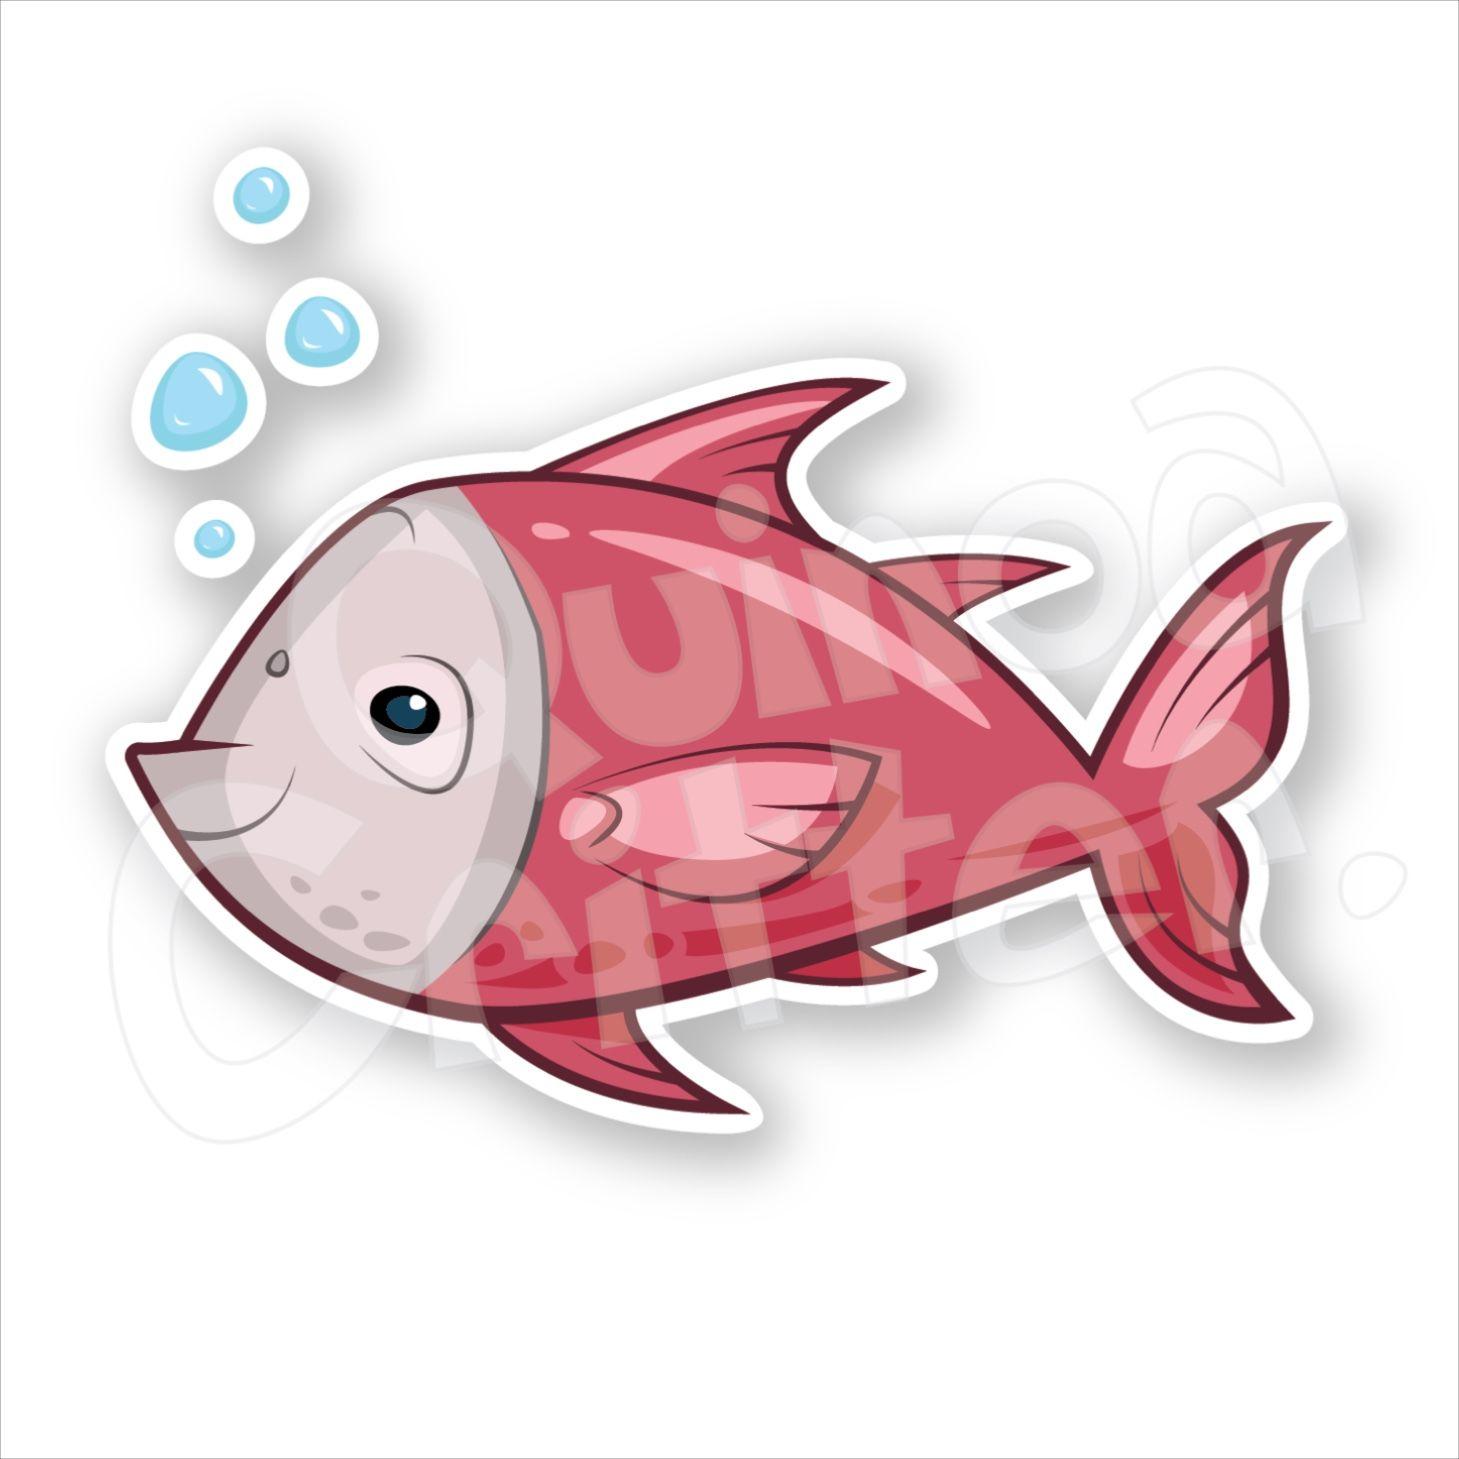 Fish Clipart Digital Download Png Baby Fish Cute Sea Animals Etsy In 2021 Cartoon Fish Baby Fish Sea Animals